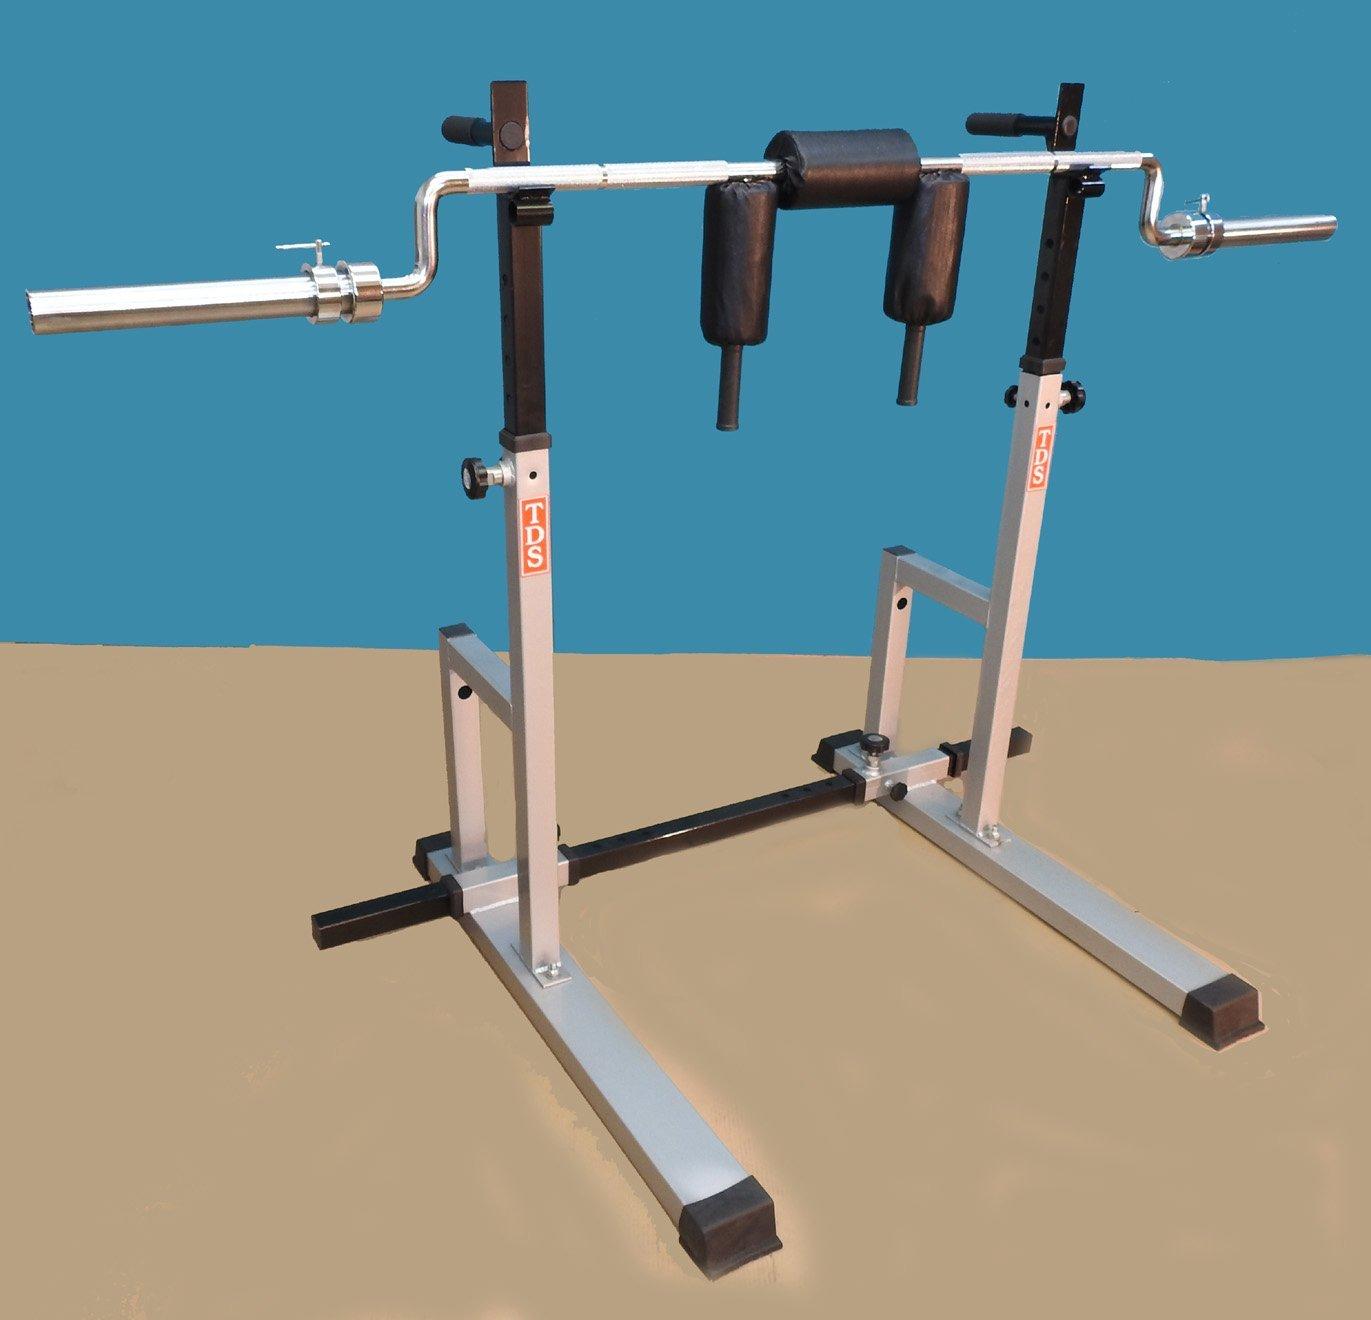 mega-safety-squat-bar-1000-lb-rated-by-tds